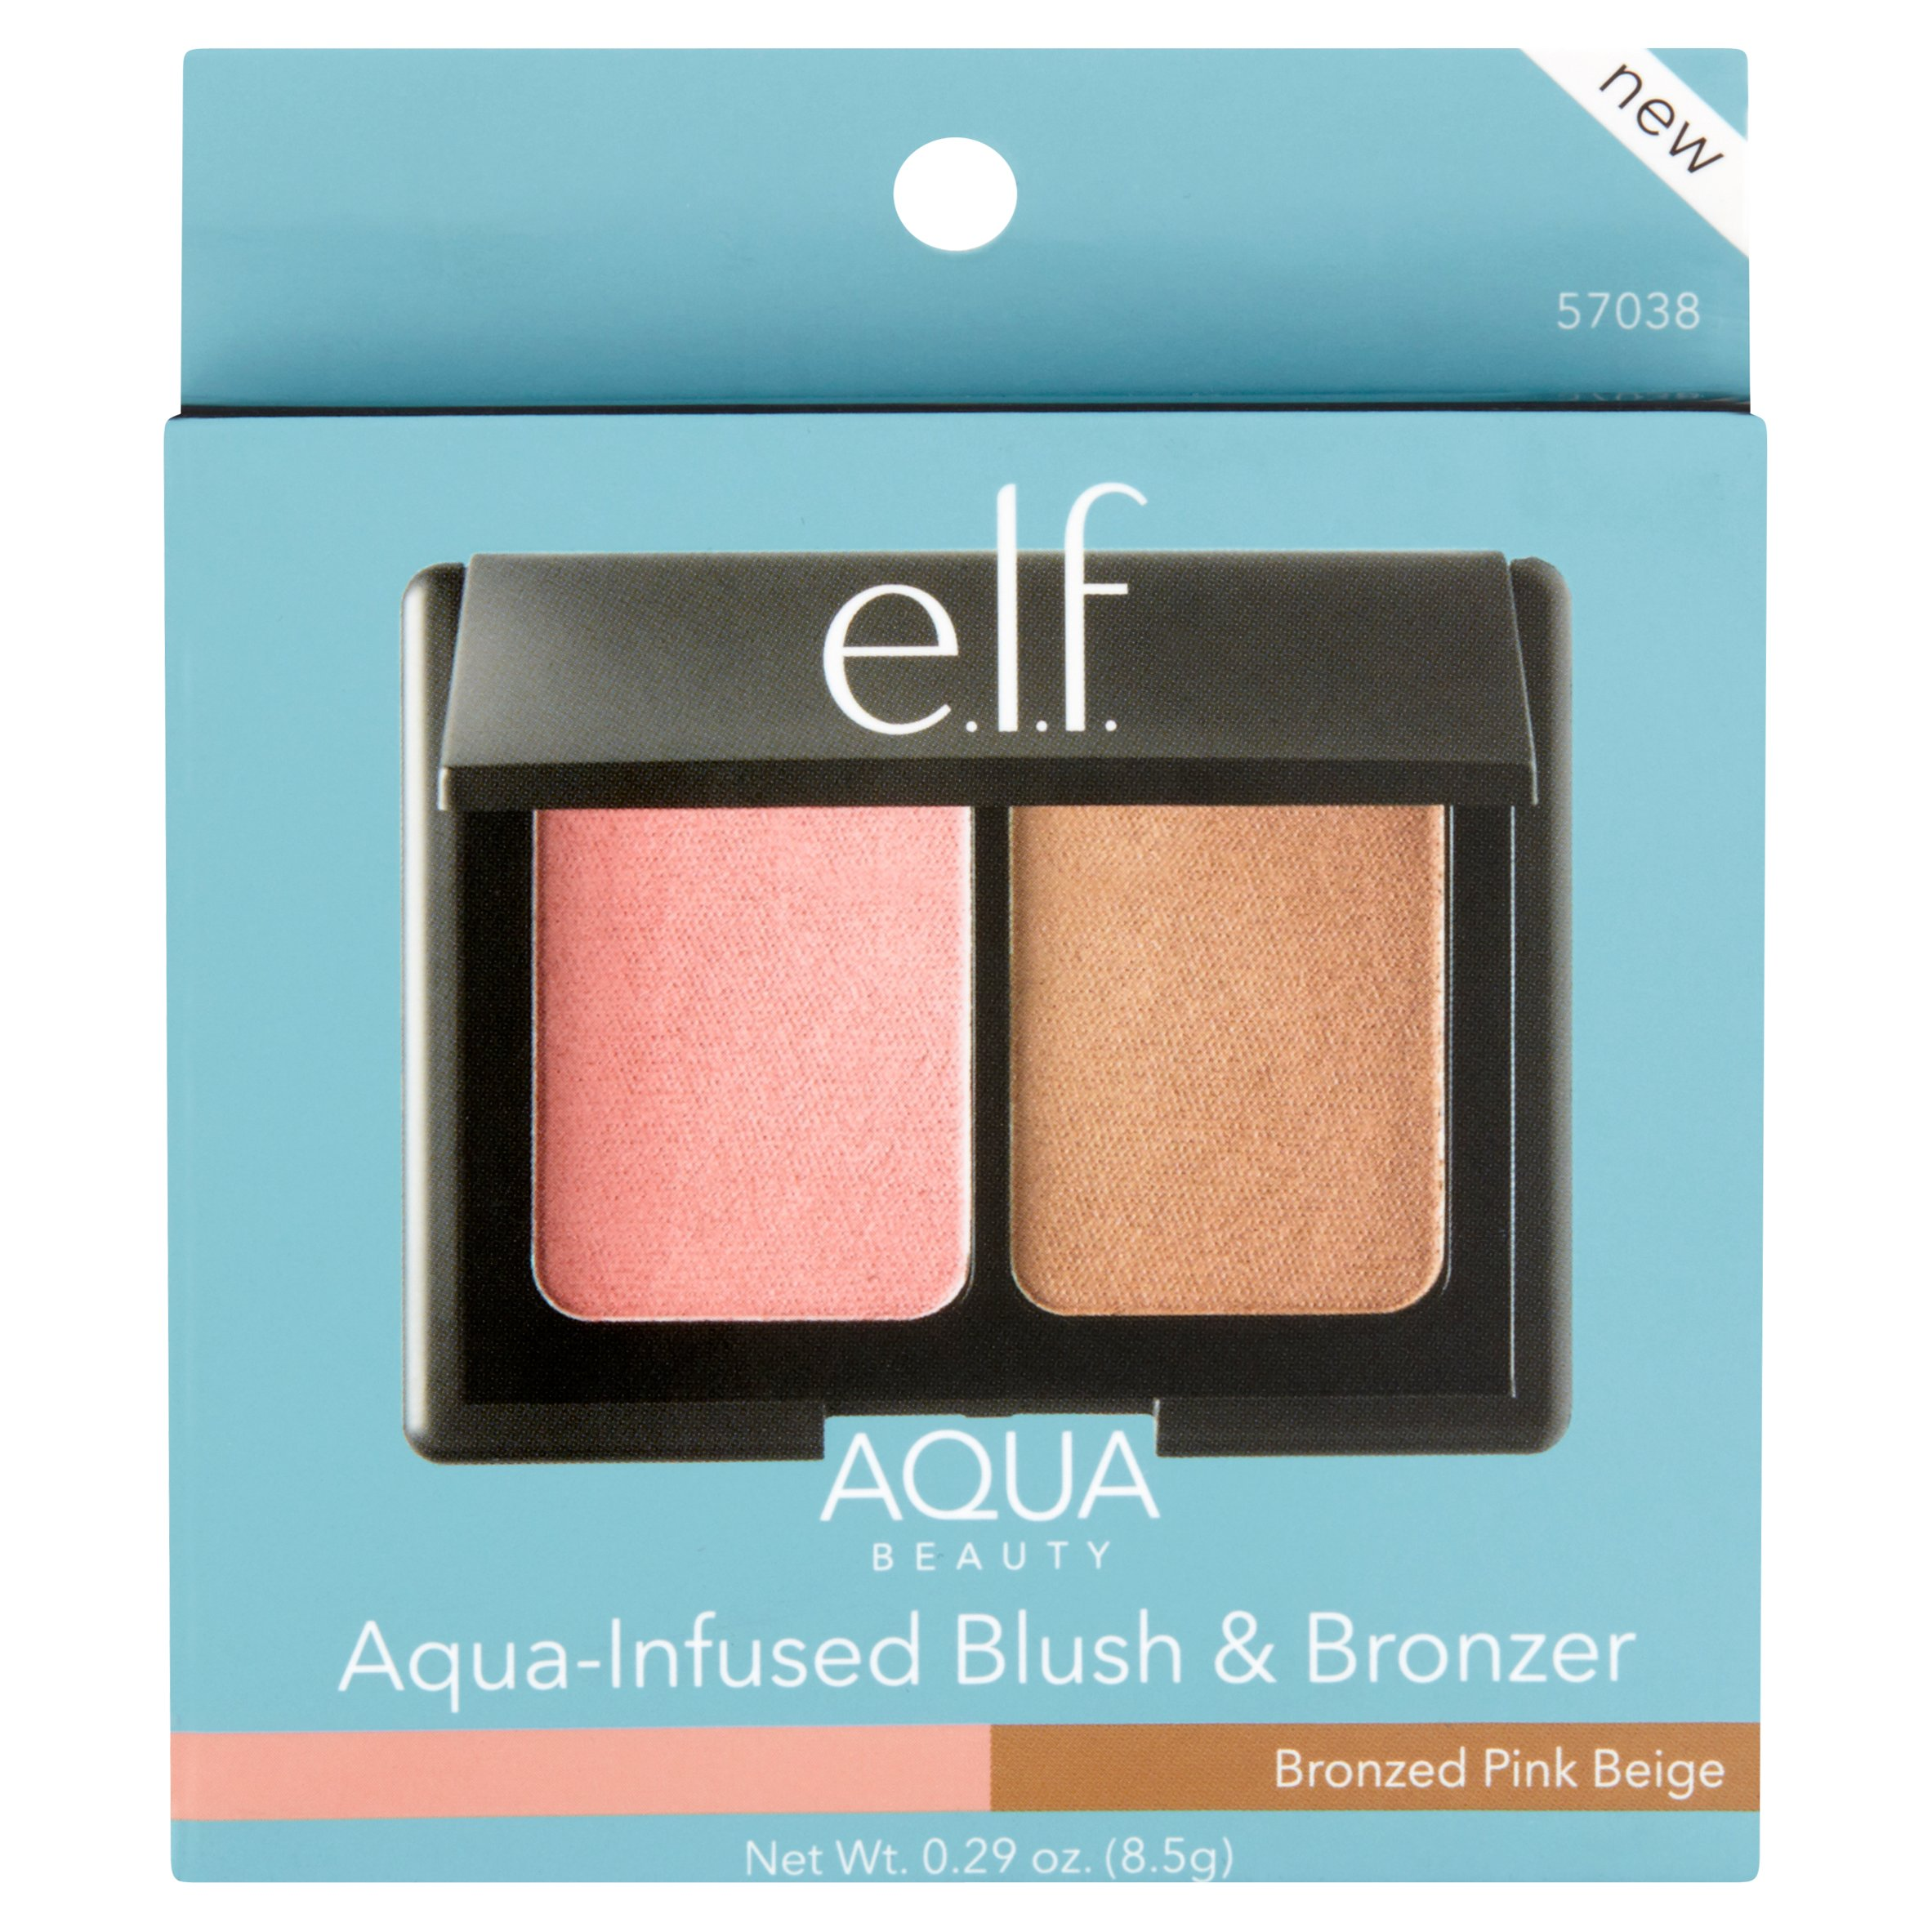 e.l.f. Cosmetics Aqua Beauty Blush & Bronzer, Bronzed Pink Beige